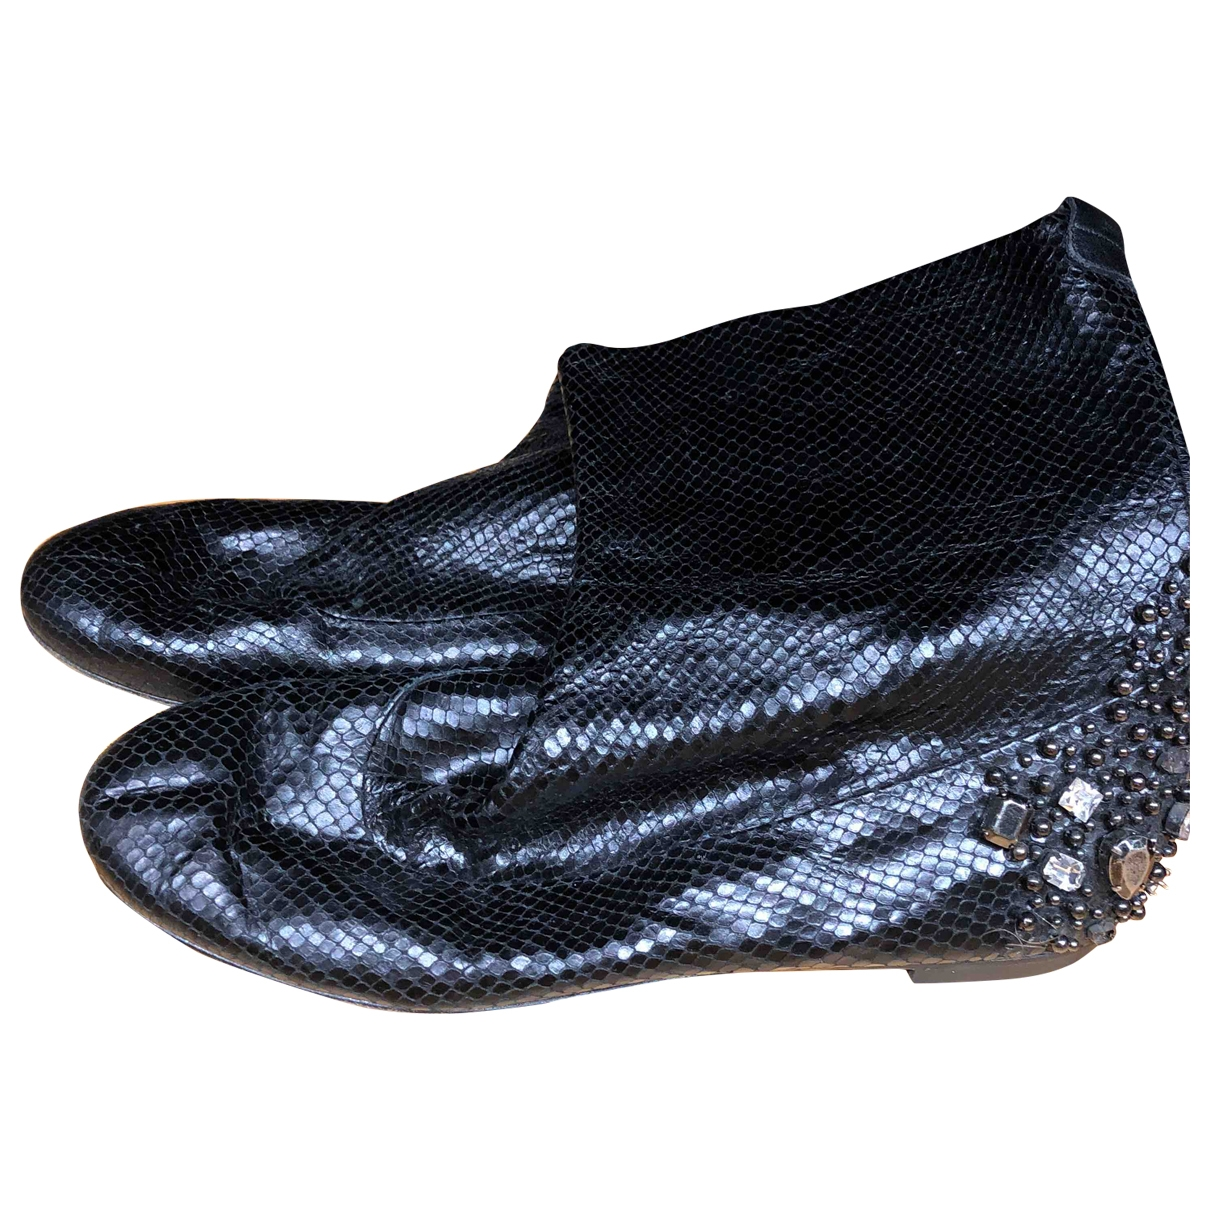 Giuseppe Zanotti \N Black Leather Ankle boots for Women 41 EU